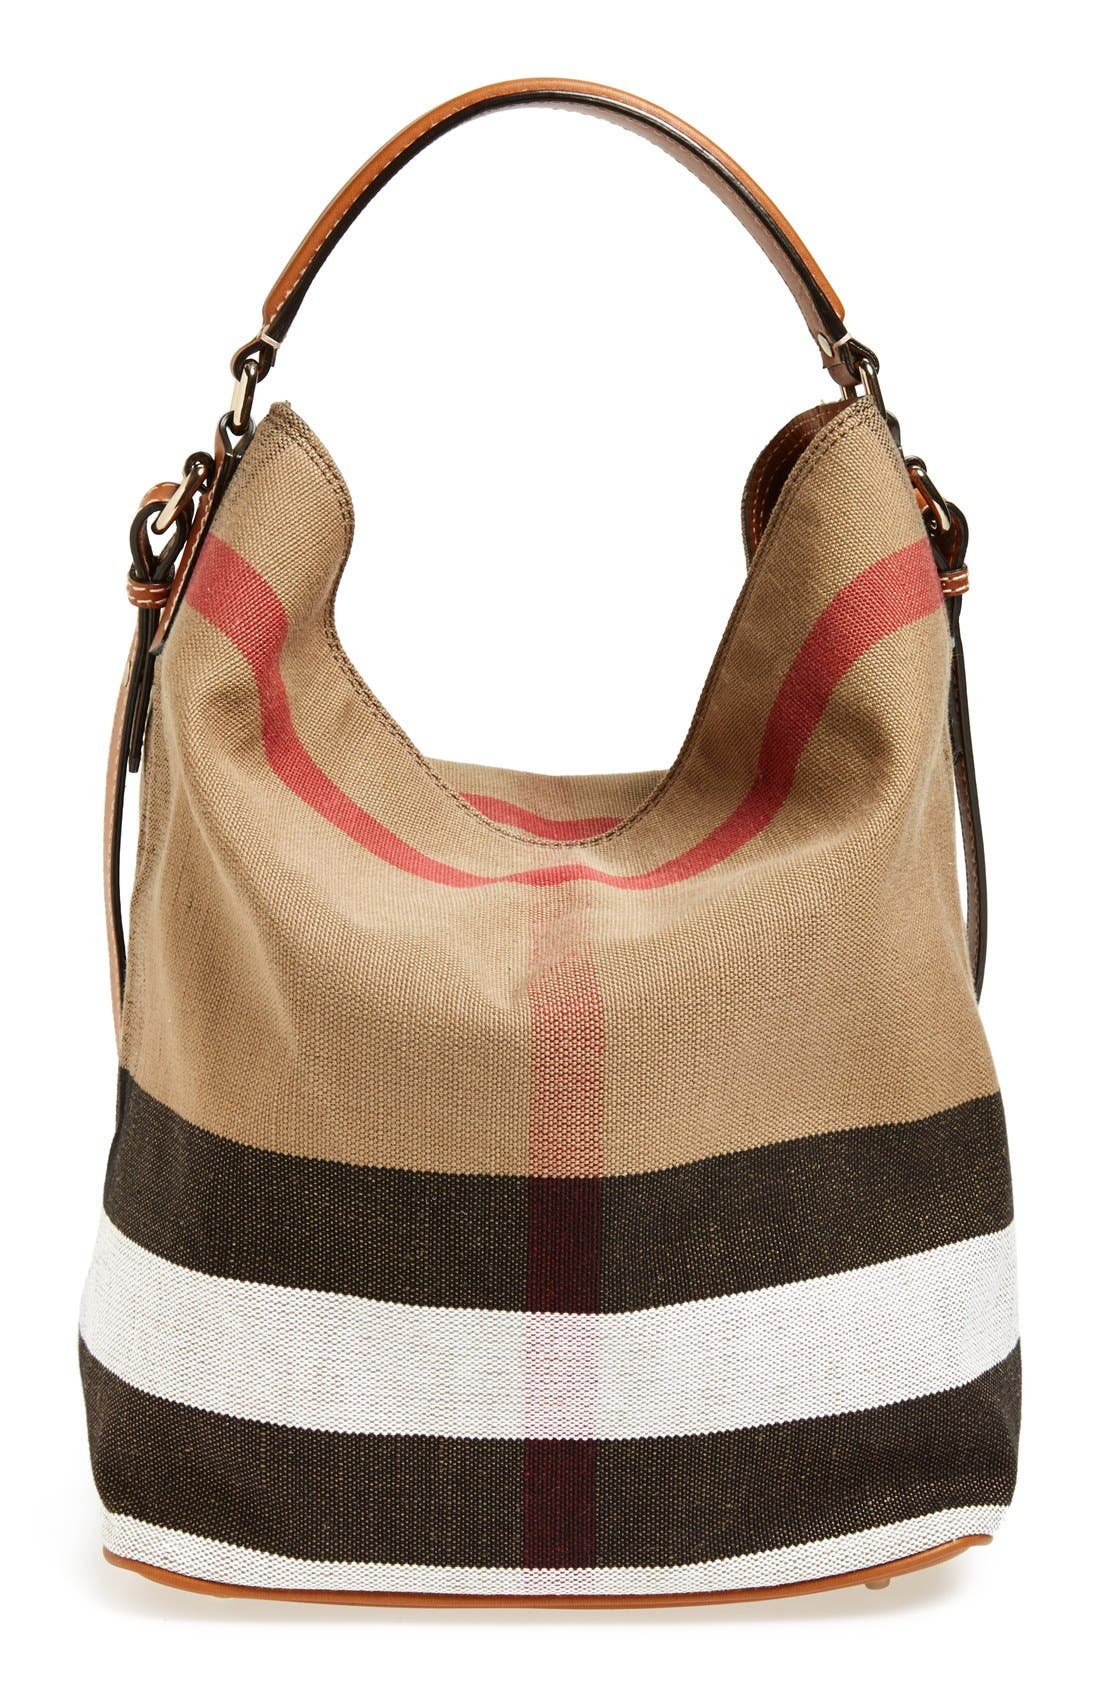 Main Image - Burberry Medium Ashby Check Print Bucket Bag